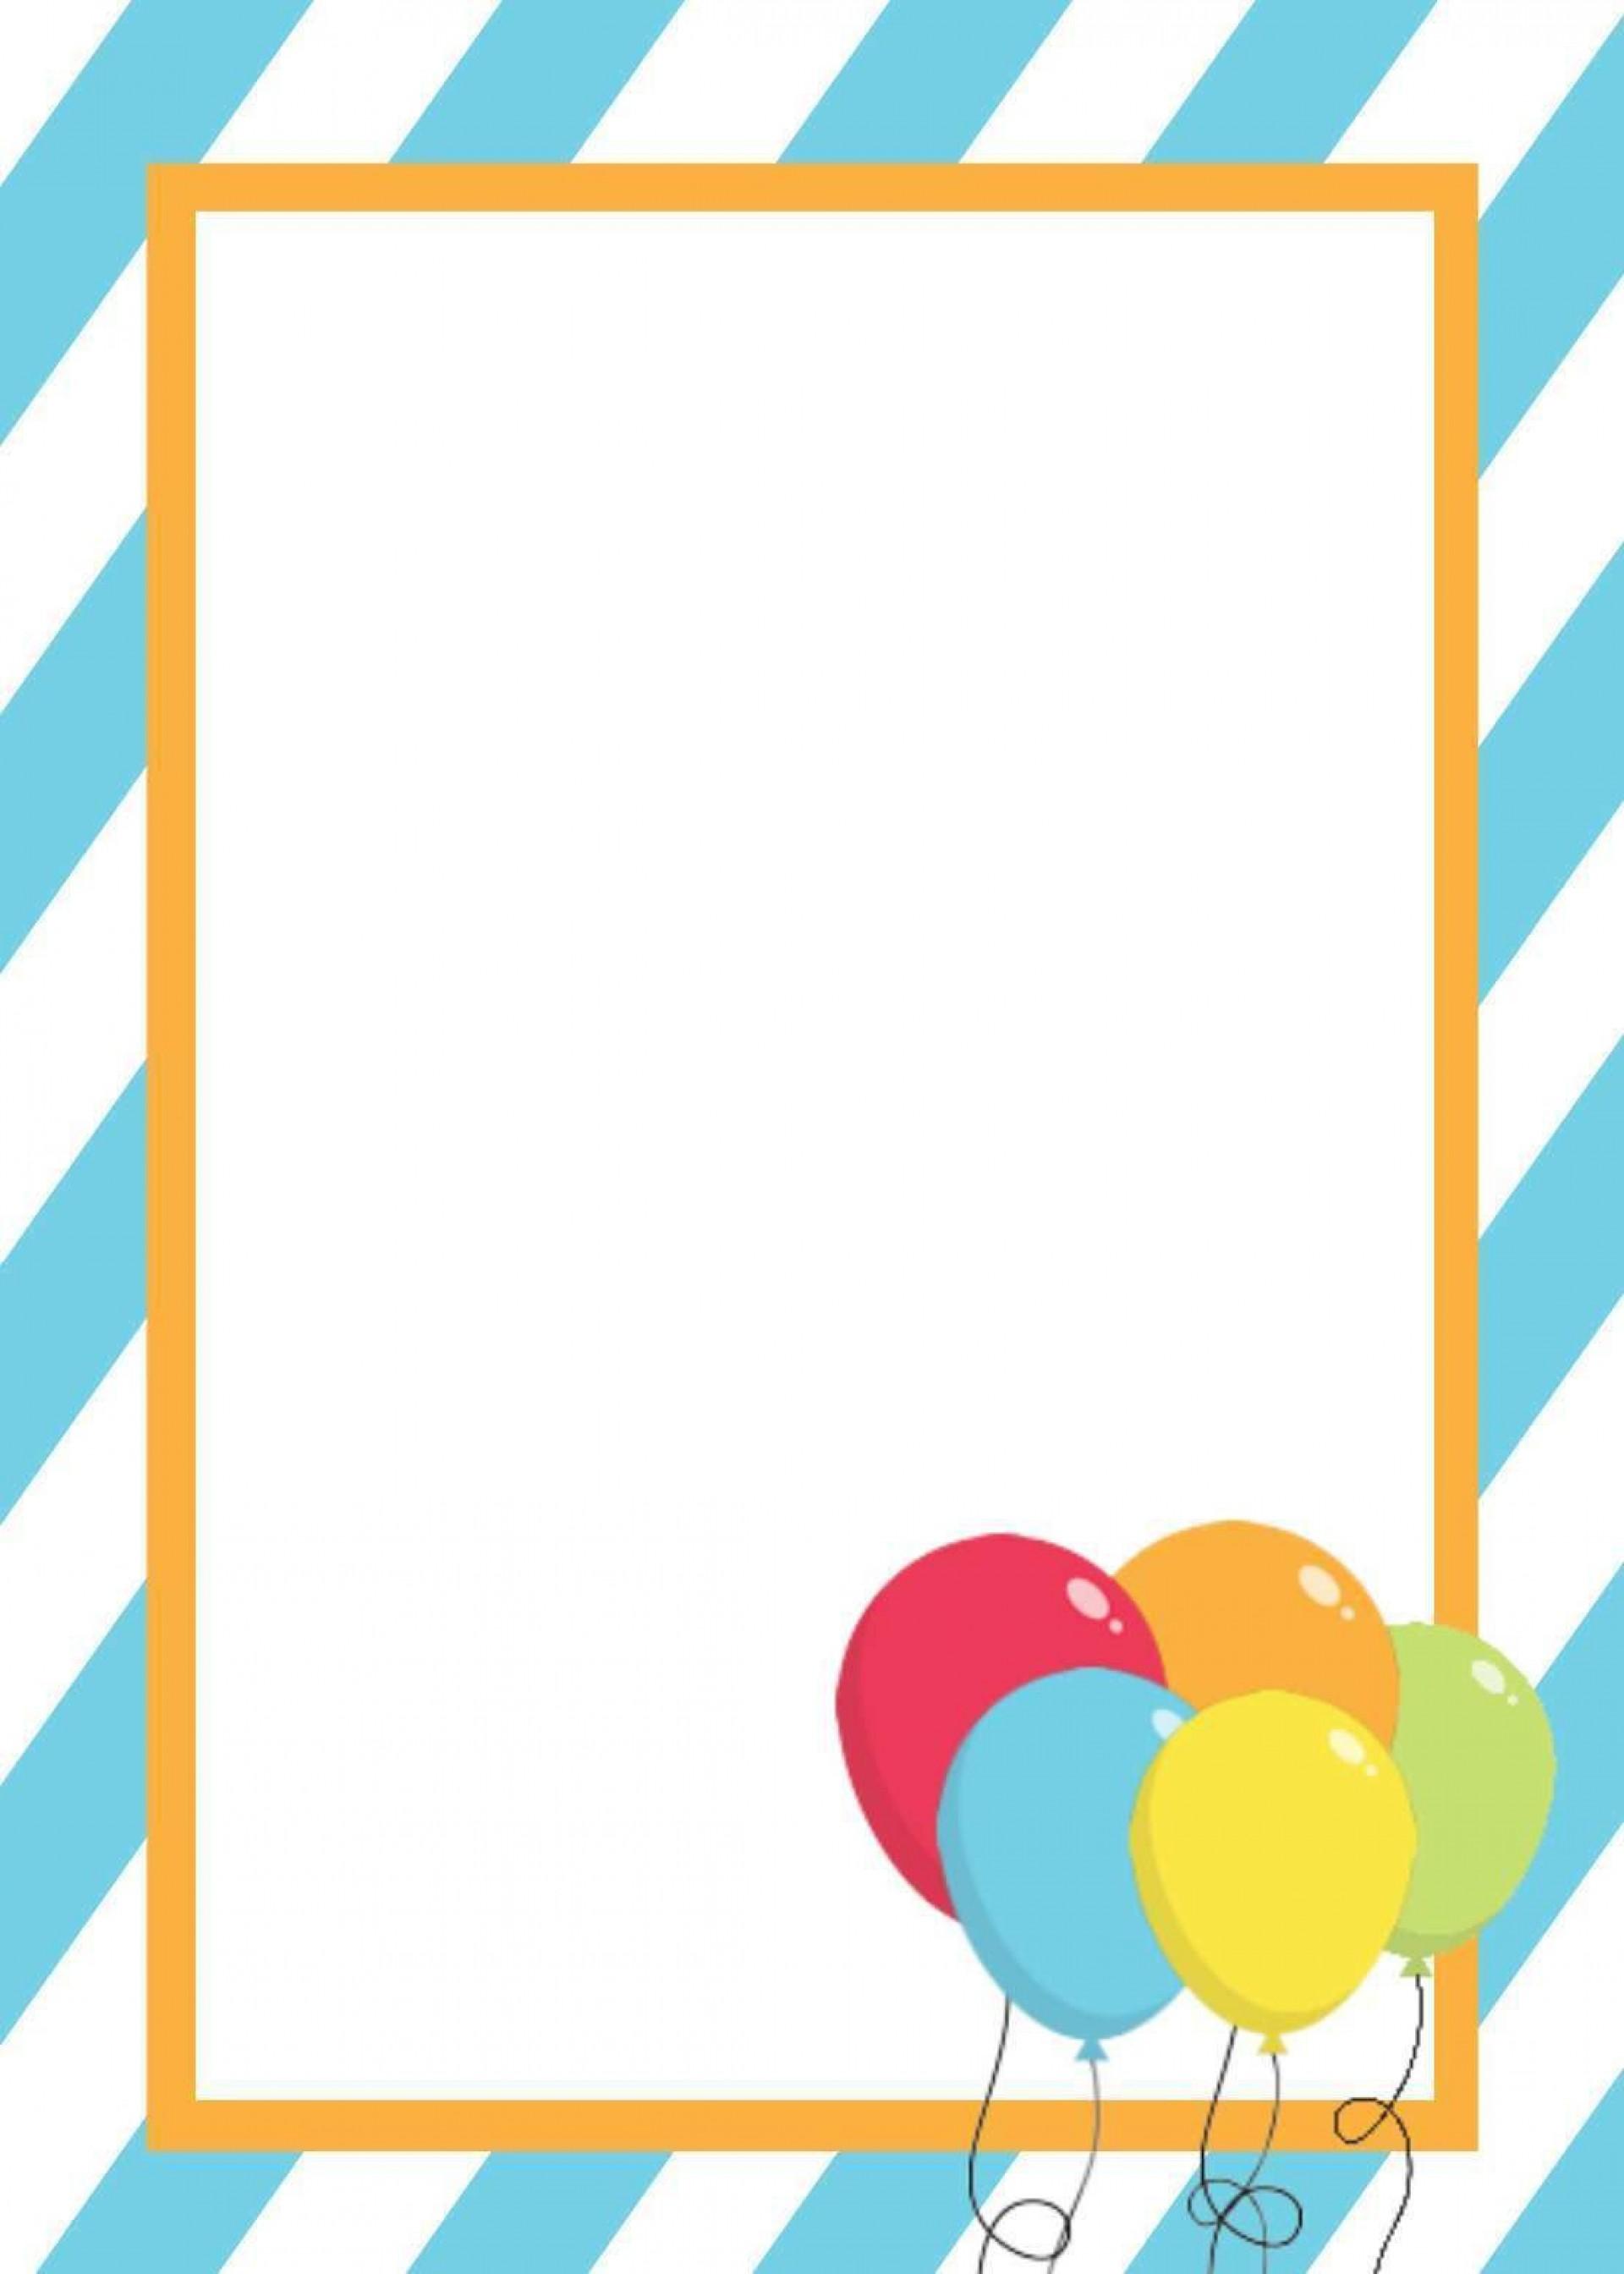 001 Breathtaking Party Invitation Template Word Design  Dinner Summer Wording Sample Unicorn Birthday1920